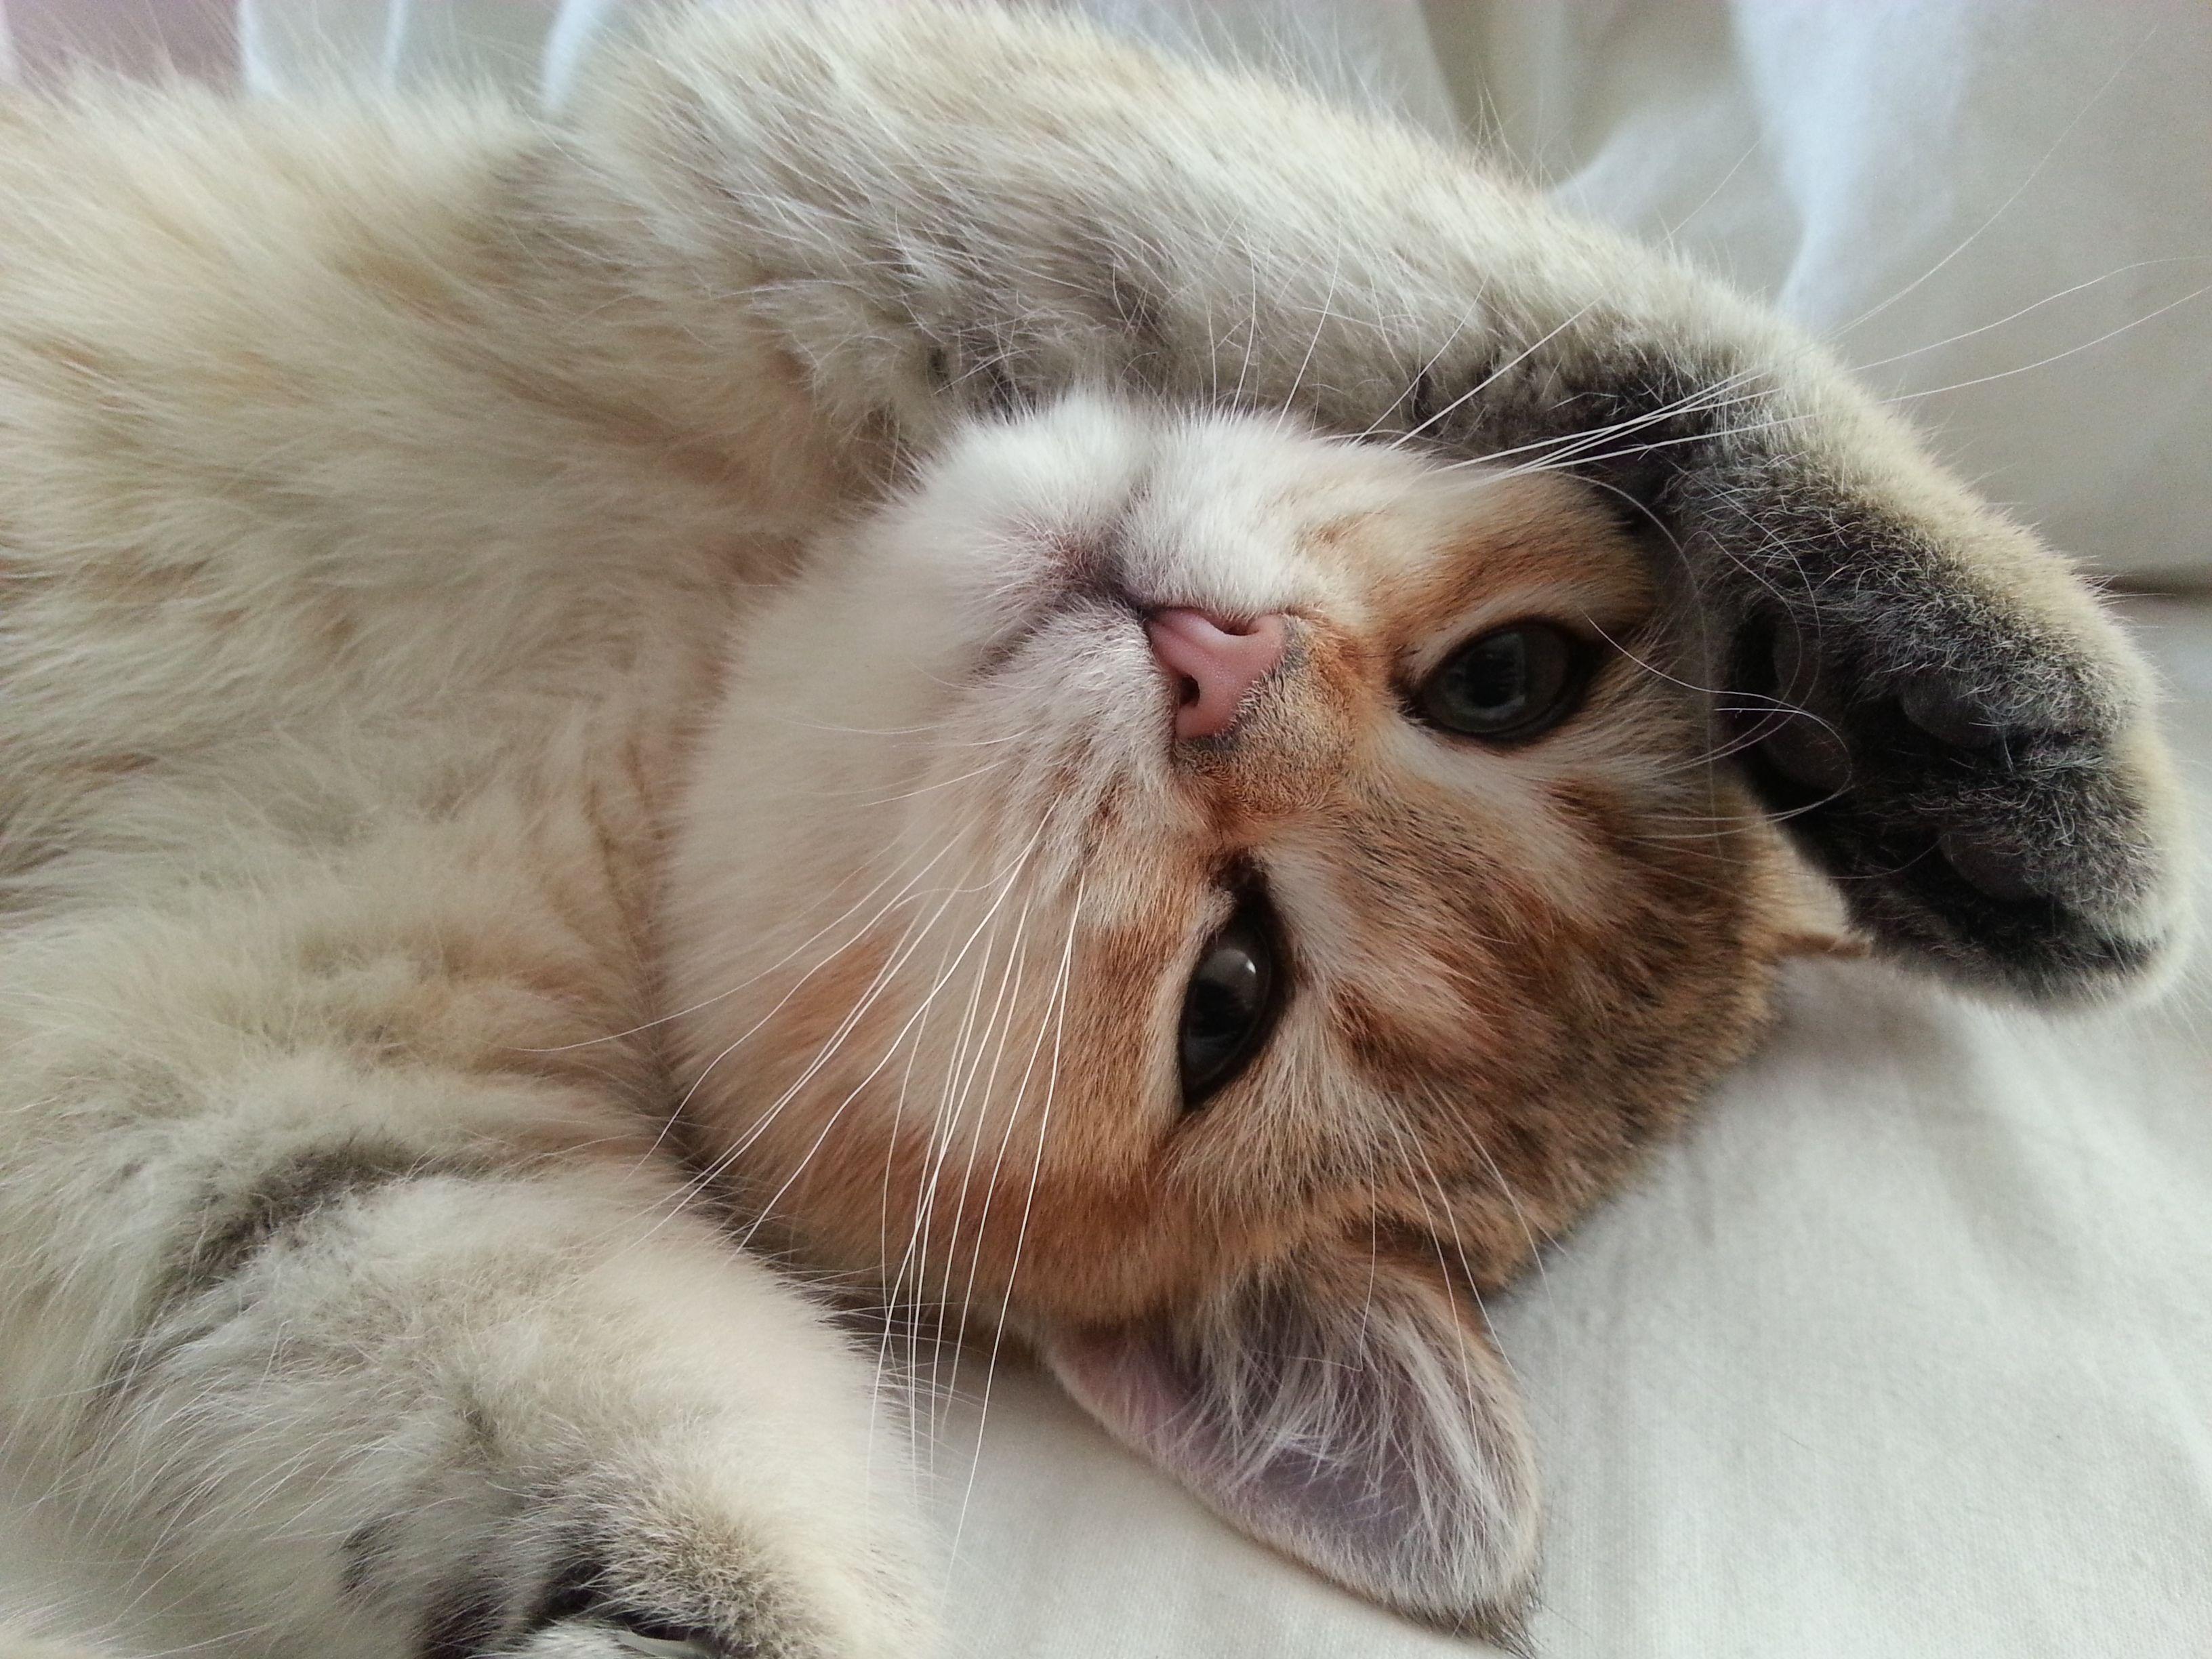 My Sweet Cat 14 Weeks Old British Shorthair Black Golden Shaded British Shorthair Beautiful Cats British Shorthair Cats